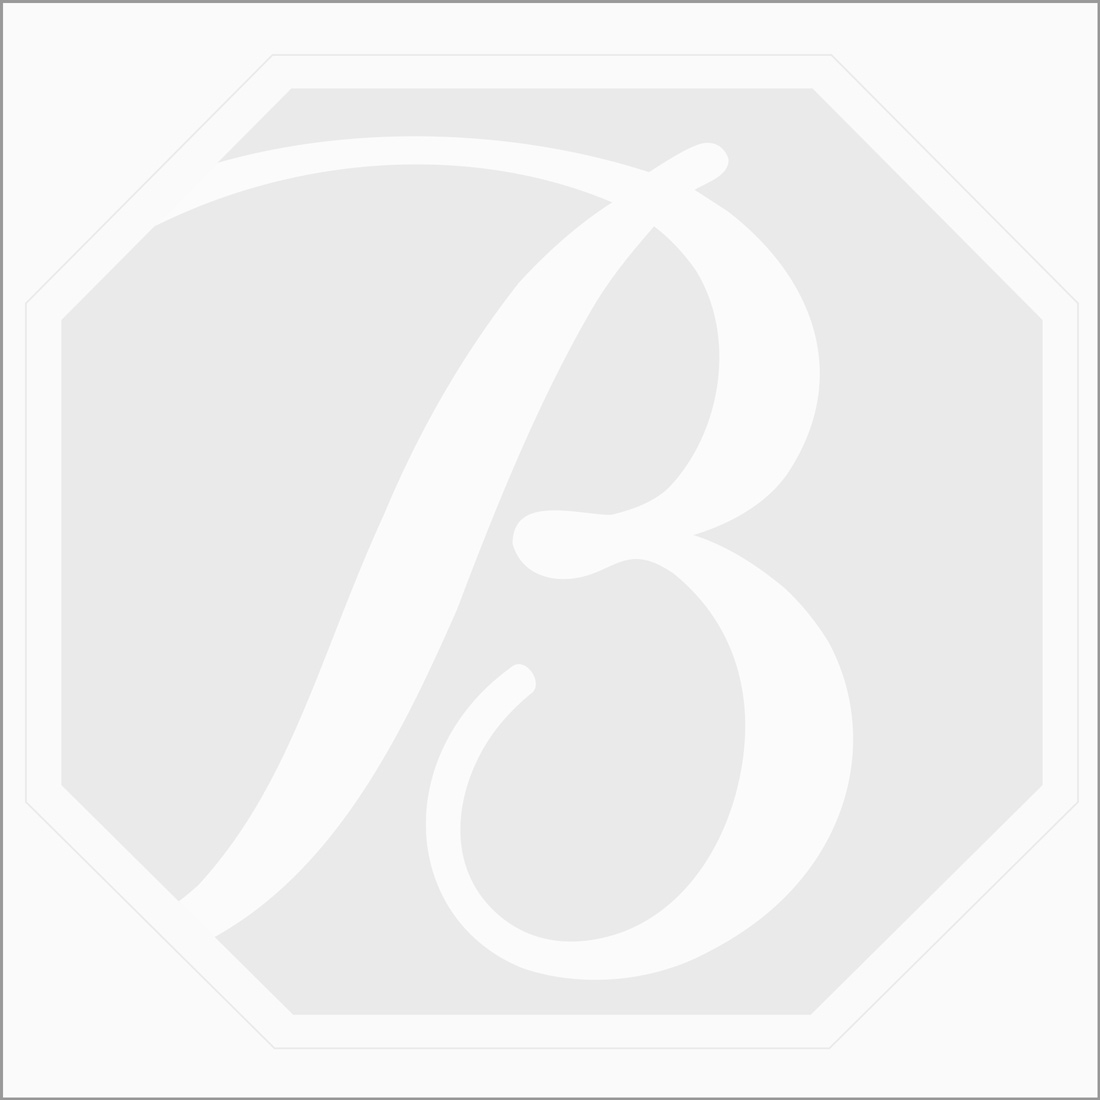 3 Pcs - Light Blue Aquamarine Rose Cut - 18.48 ct. - 14.3 x 10.2 mm to 16.7 x 11.8 mm (AQRC1032)